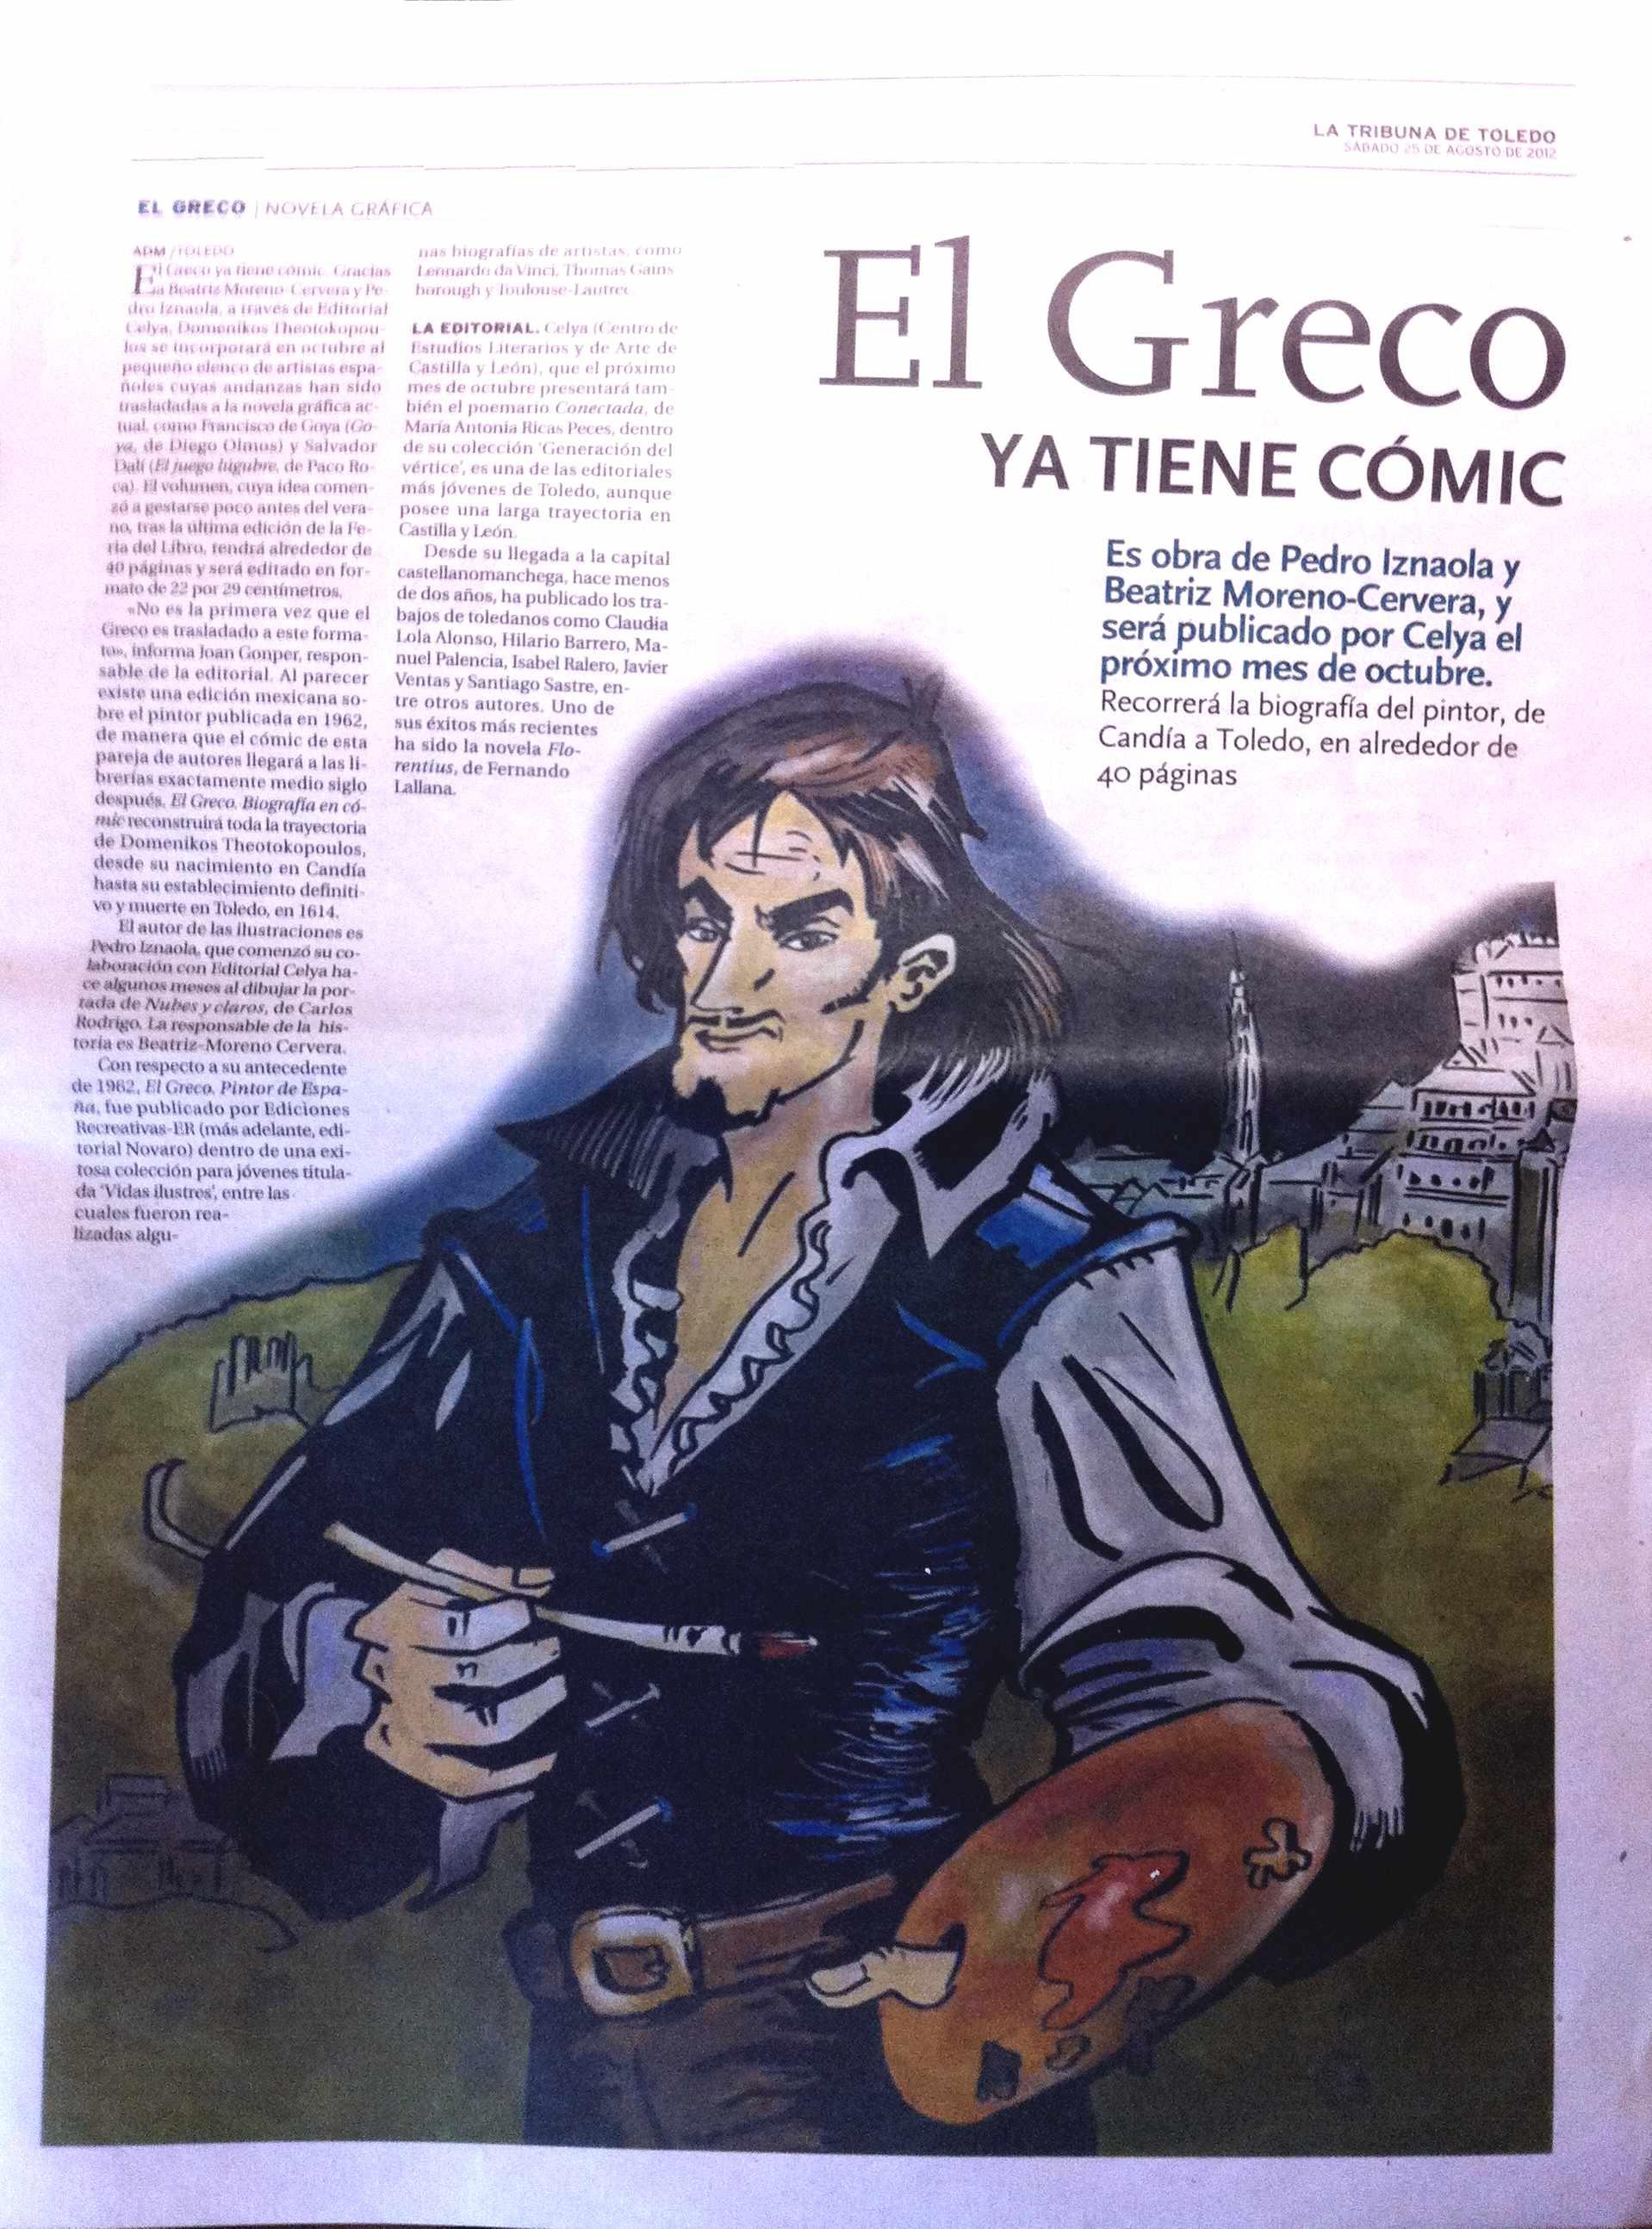 LA TRIBUNA DE TOLEDO : EL GRECO. Novela gráfica.